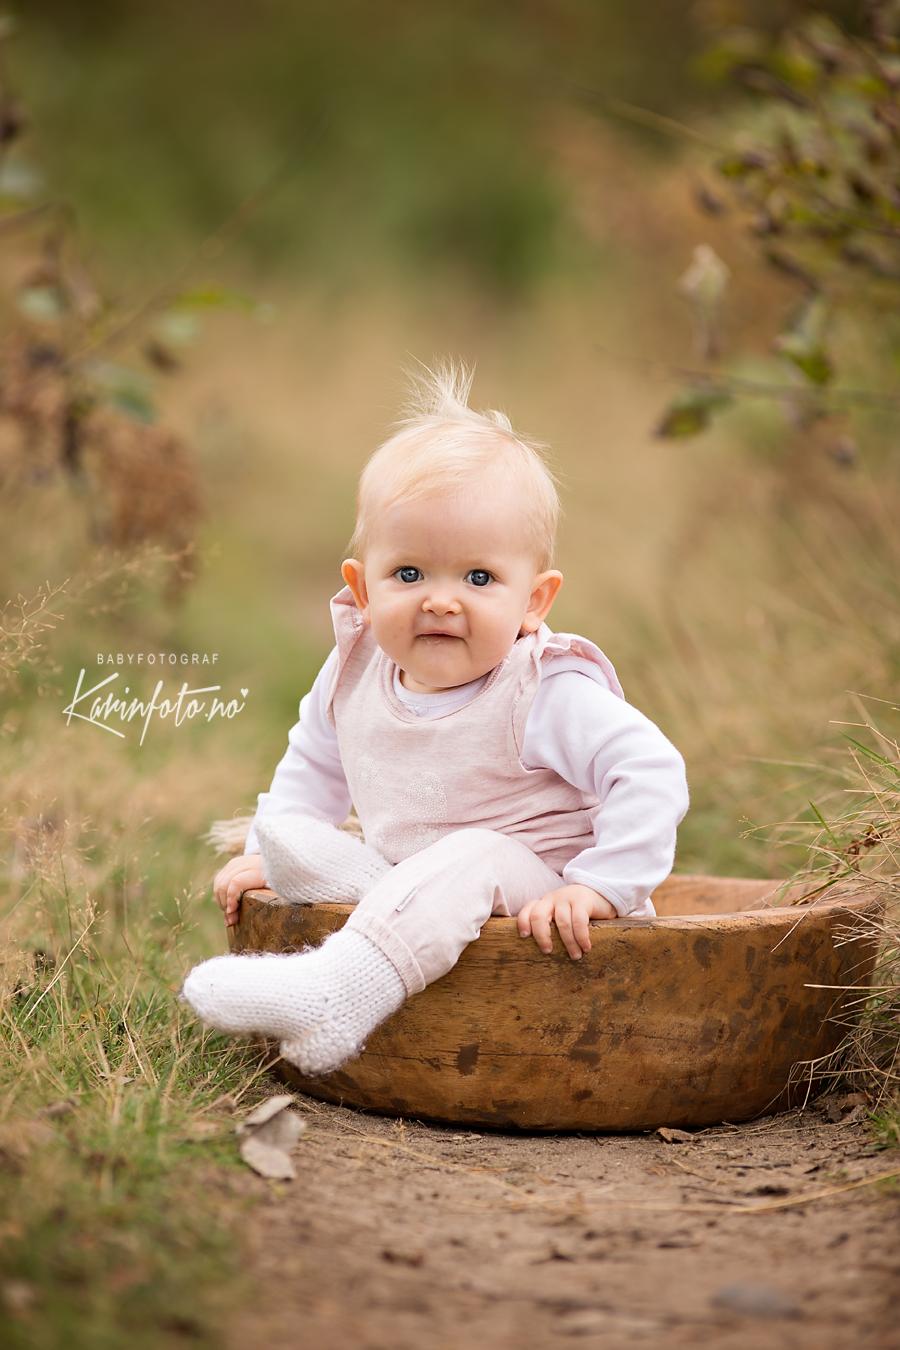 babyfotografering,karinfoto,Fotograf Karin Pedersen,Sarpsborg,Grålum,